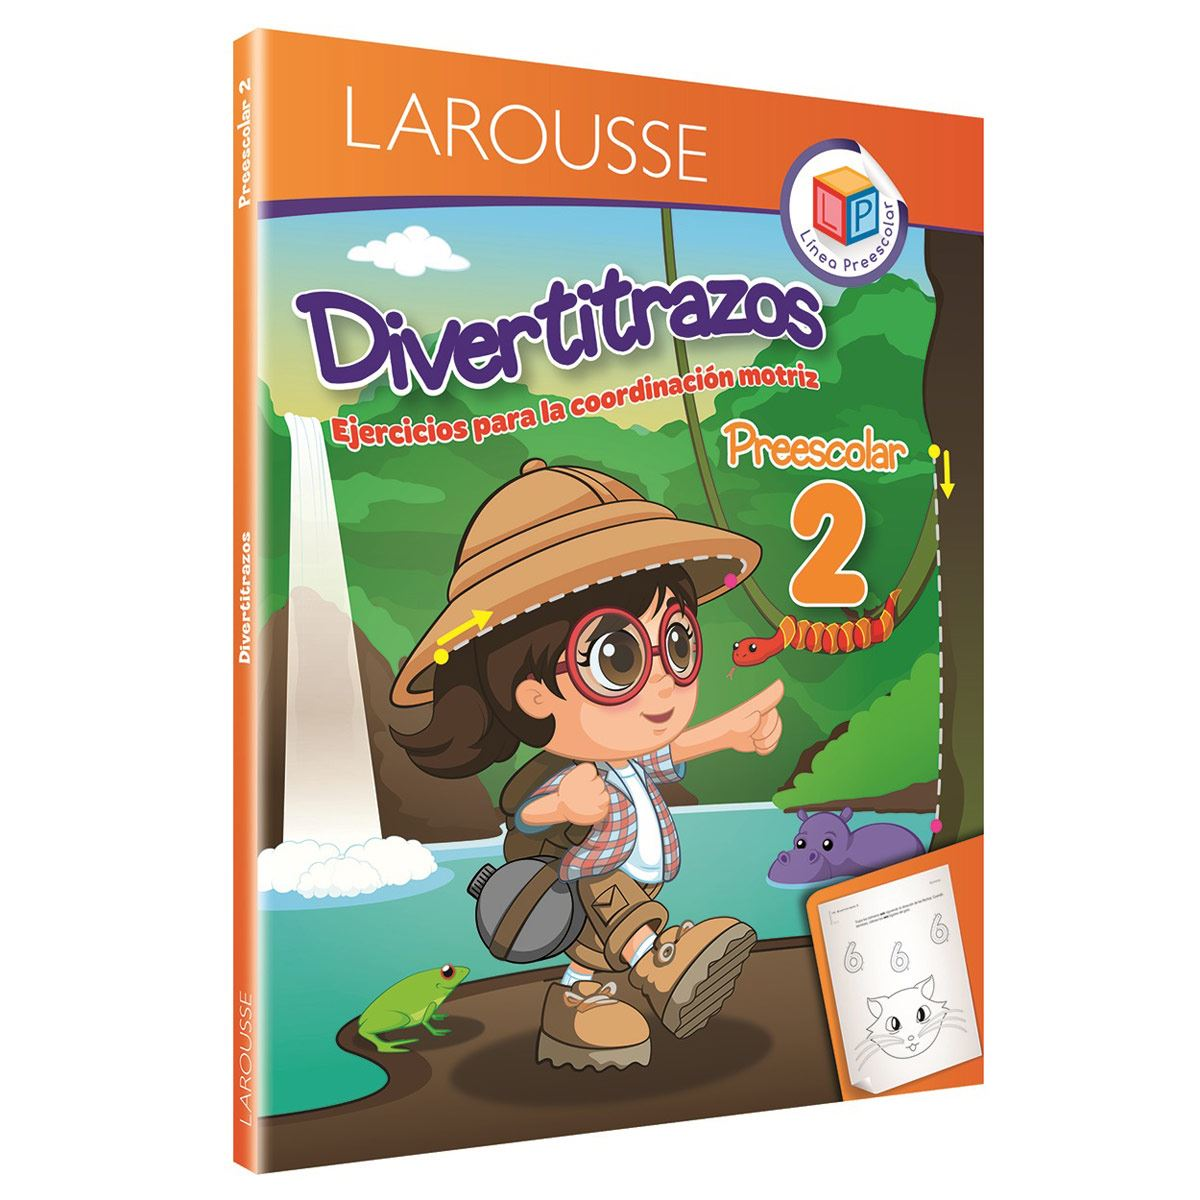 Divertitrazos 2 - Larousse